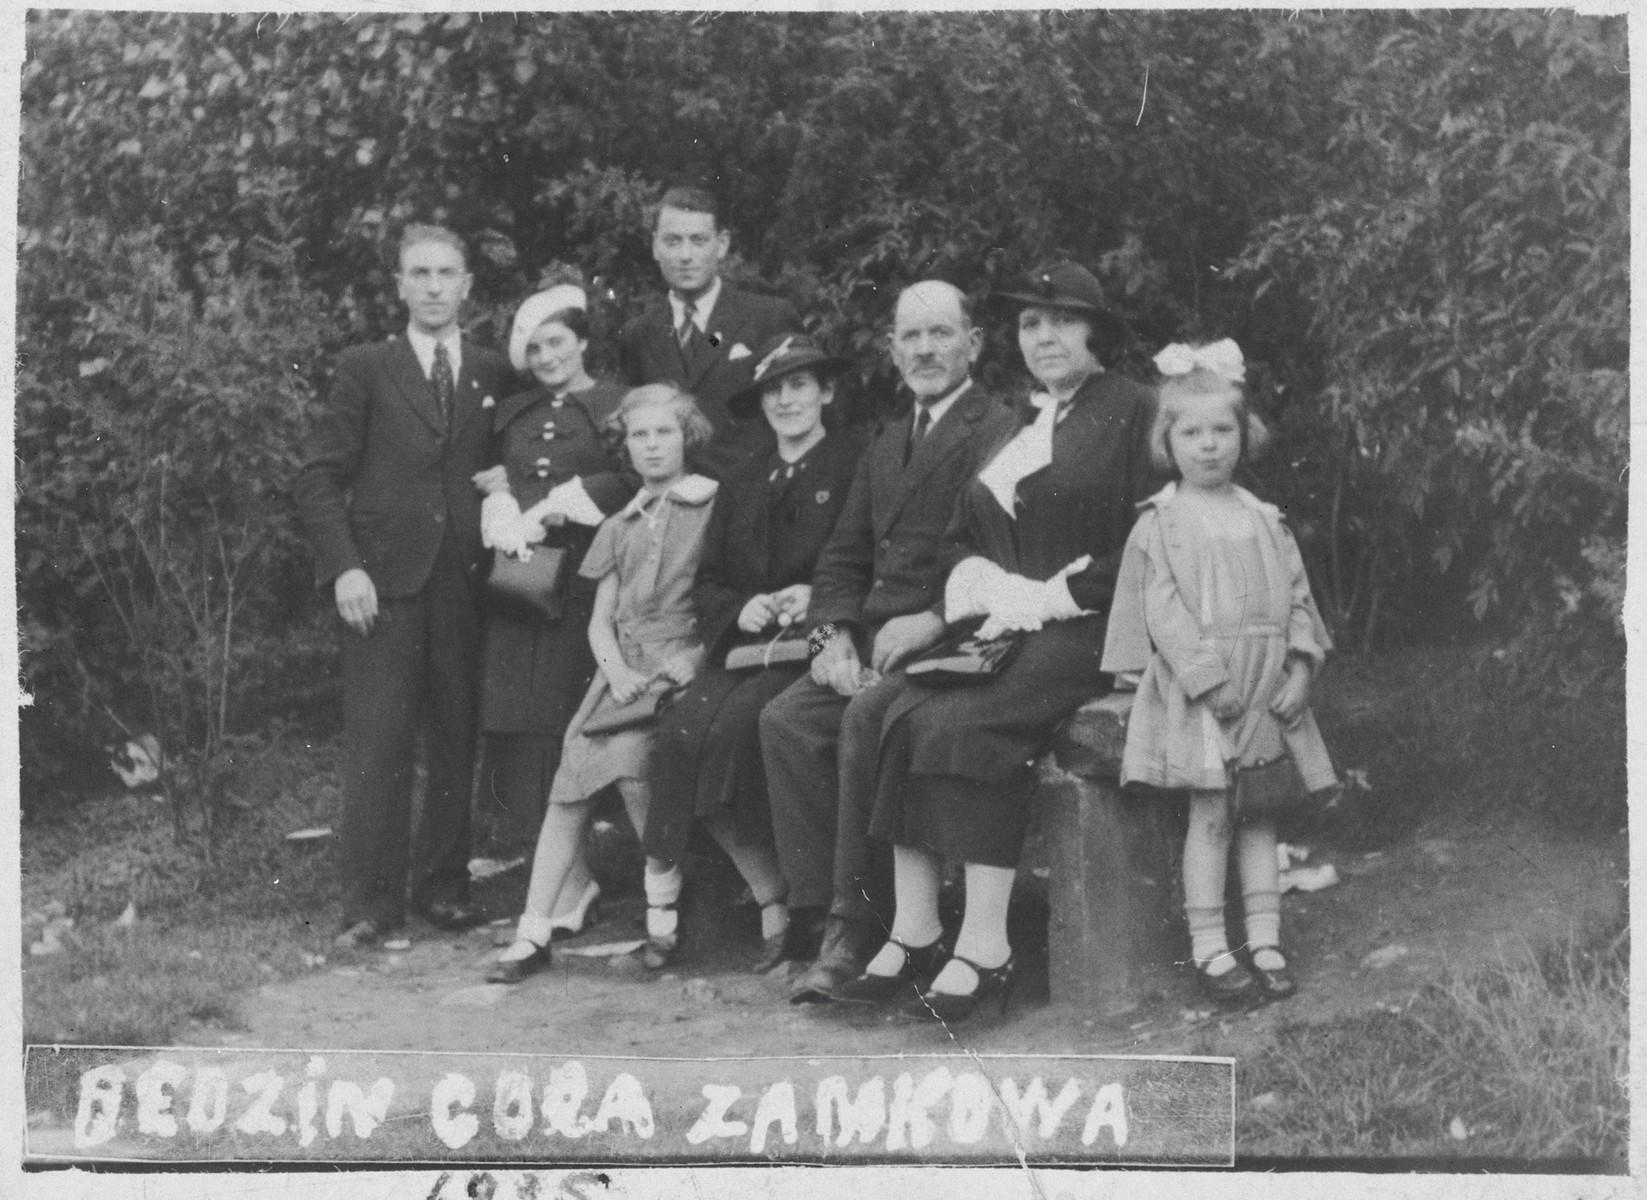 Prewar portrait of the Kaufman family of Bedzin.  Pictured are Simcha (Syrulek) Kaufman, Vera Pfeffer, David Kaufman, Lea (Lola) Kaufman, Adela Kaufman, Moses Kaufman, Fela Pfeffer and Bala Kaufman.